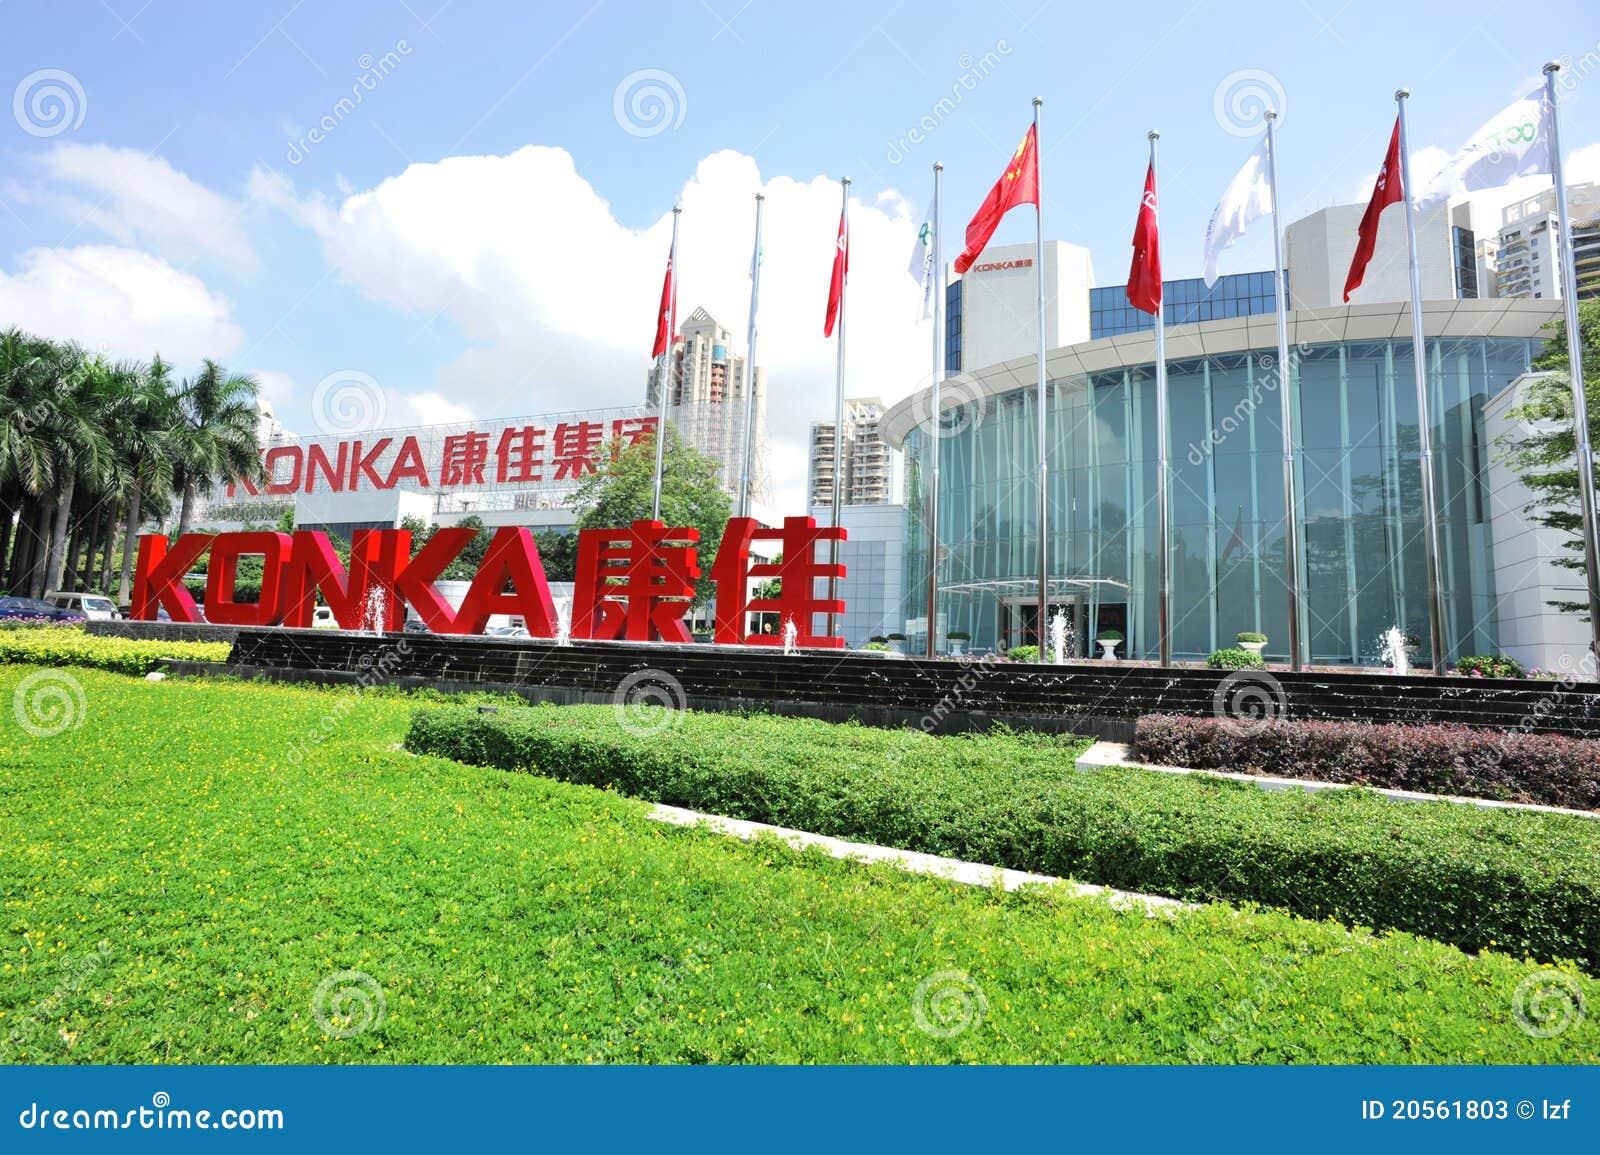 Konka Group Factory,shenzhen,china Editorial Stock Photo